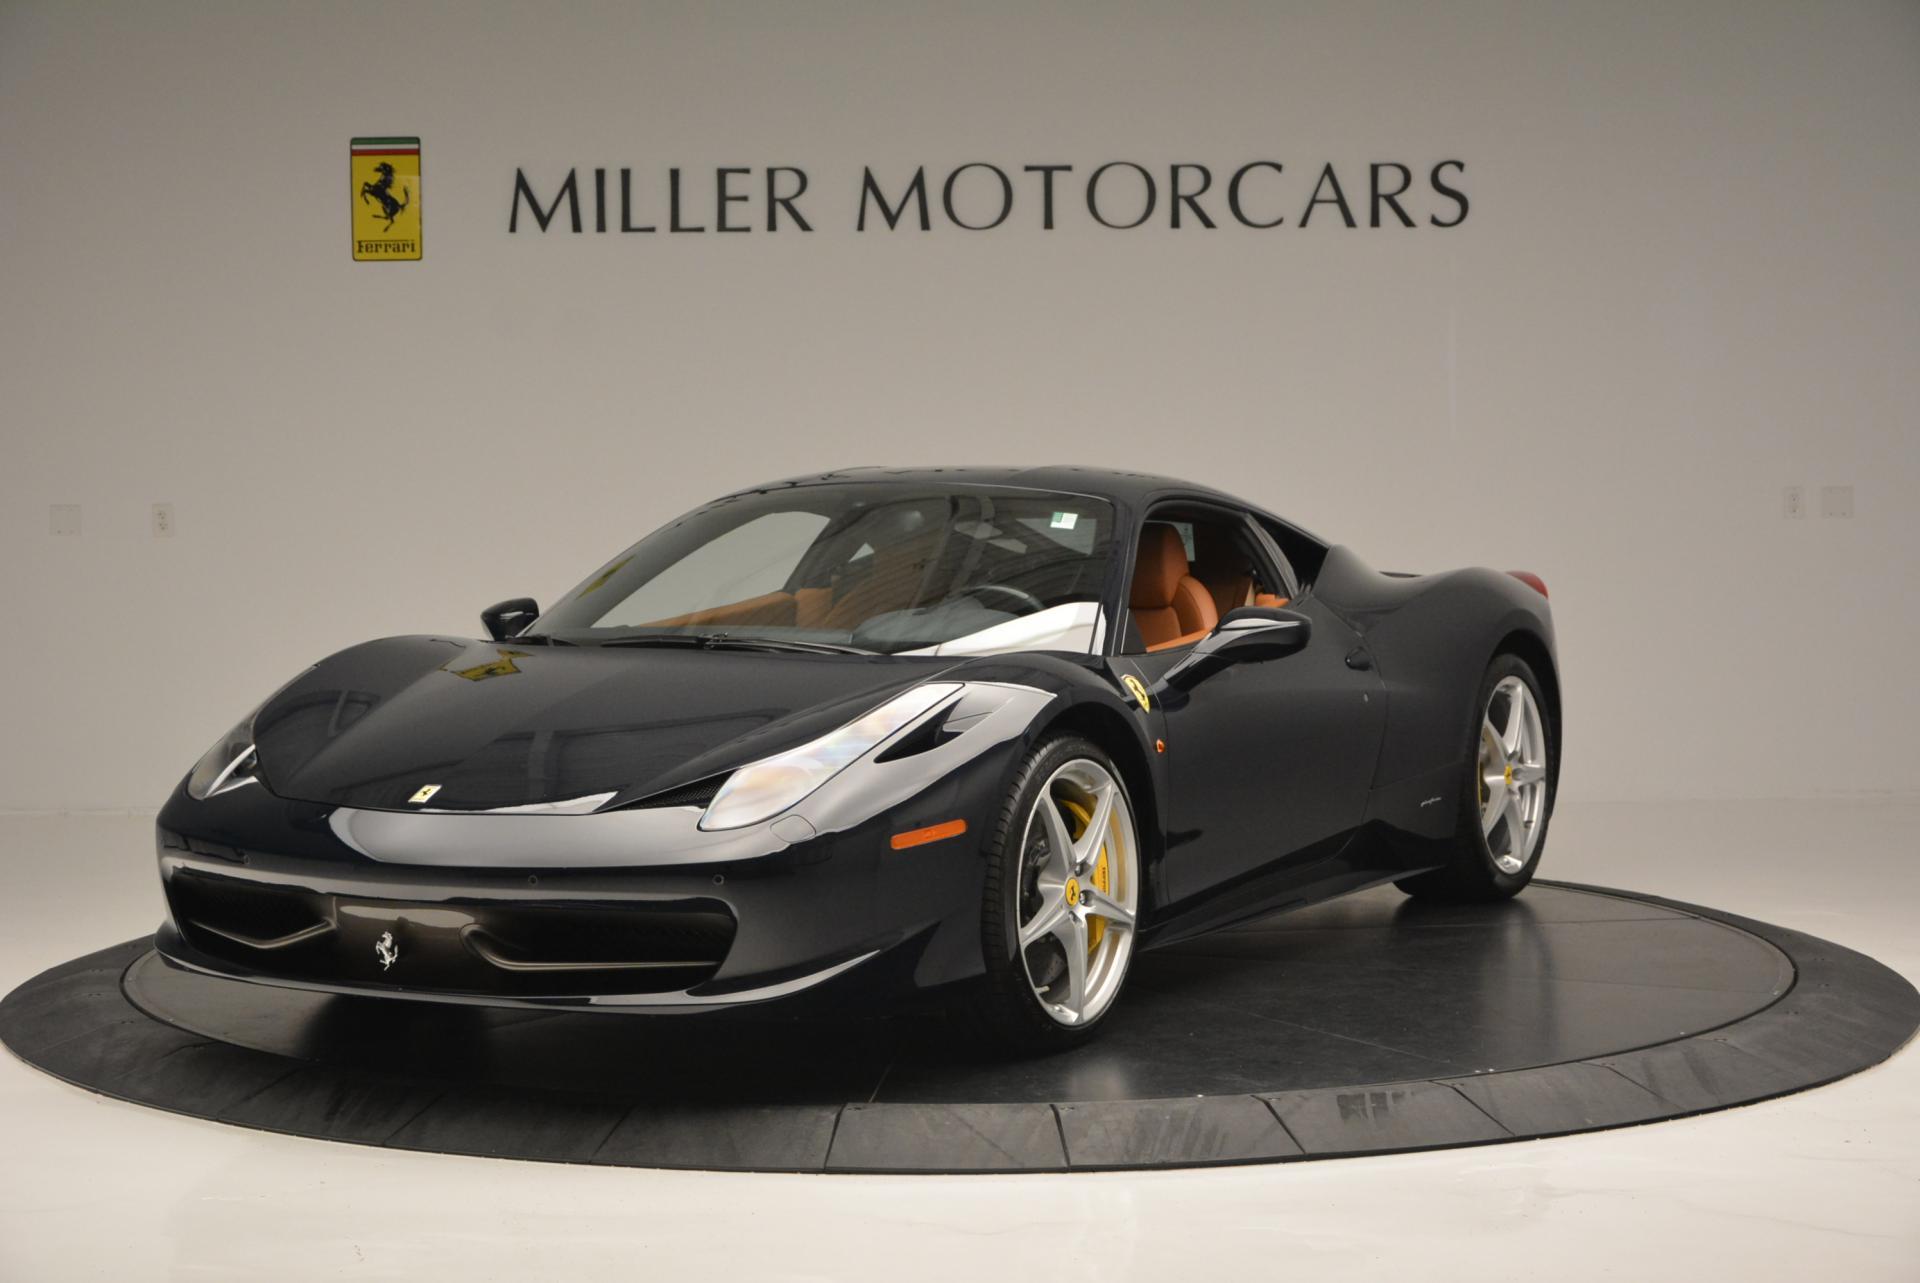 Pre Owned 2010 Ferrari 458 Italia For Sale Special Pricing Maserati Of Westport Stock 4332